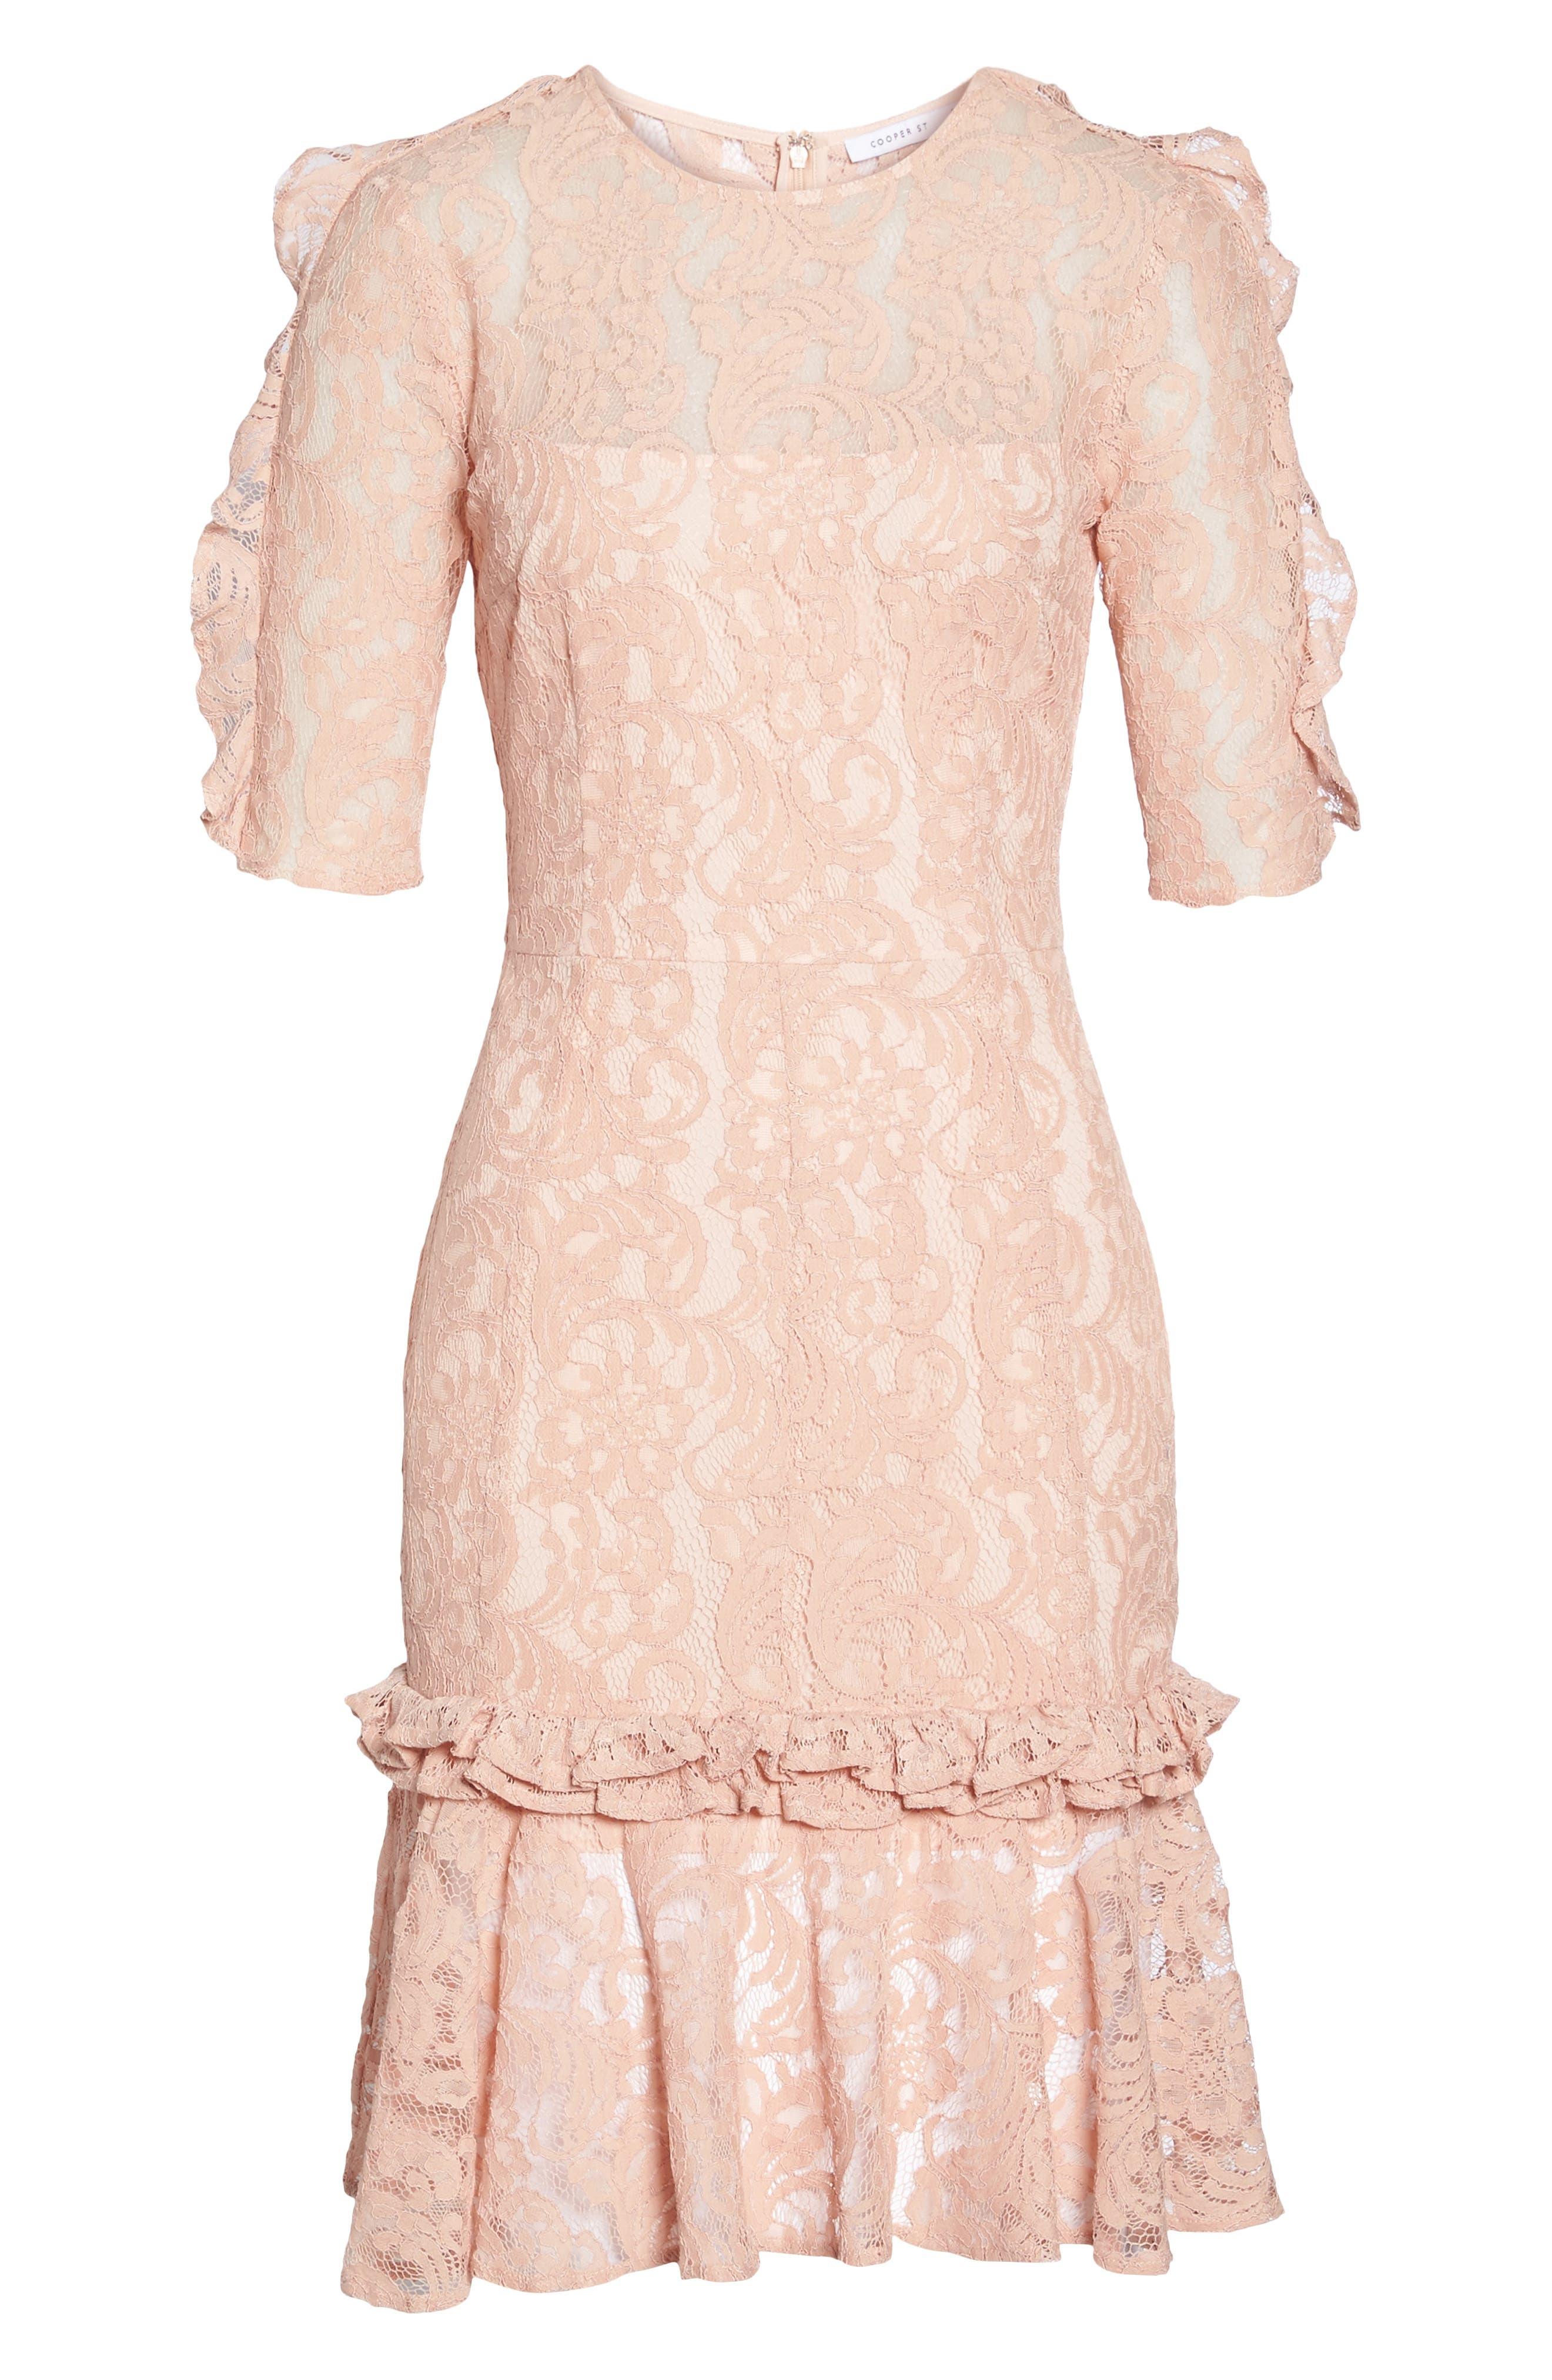 Hushed Dove Lace Dress,                             Alternate thumbnail 6, color,                             Rose Cloud